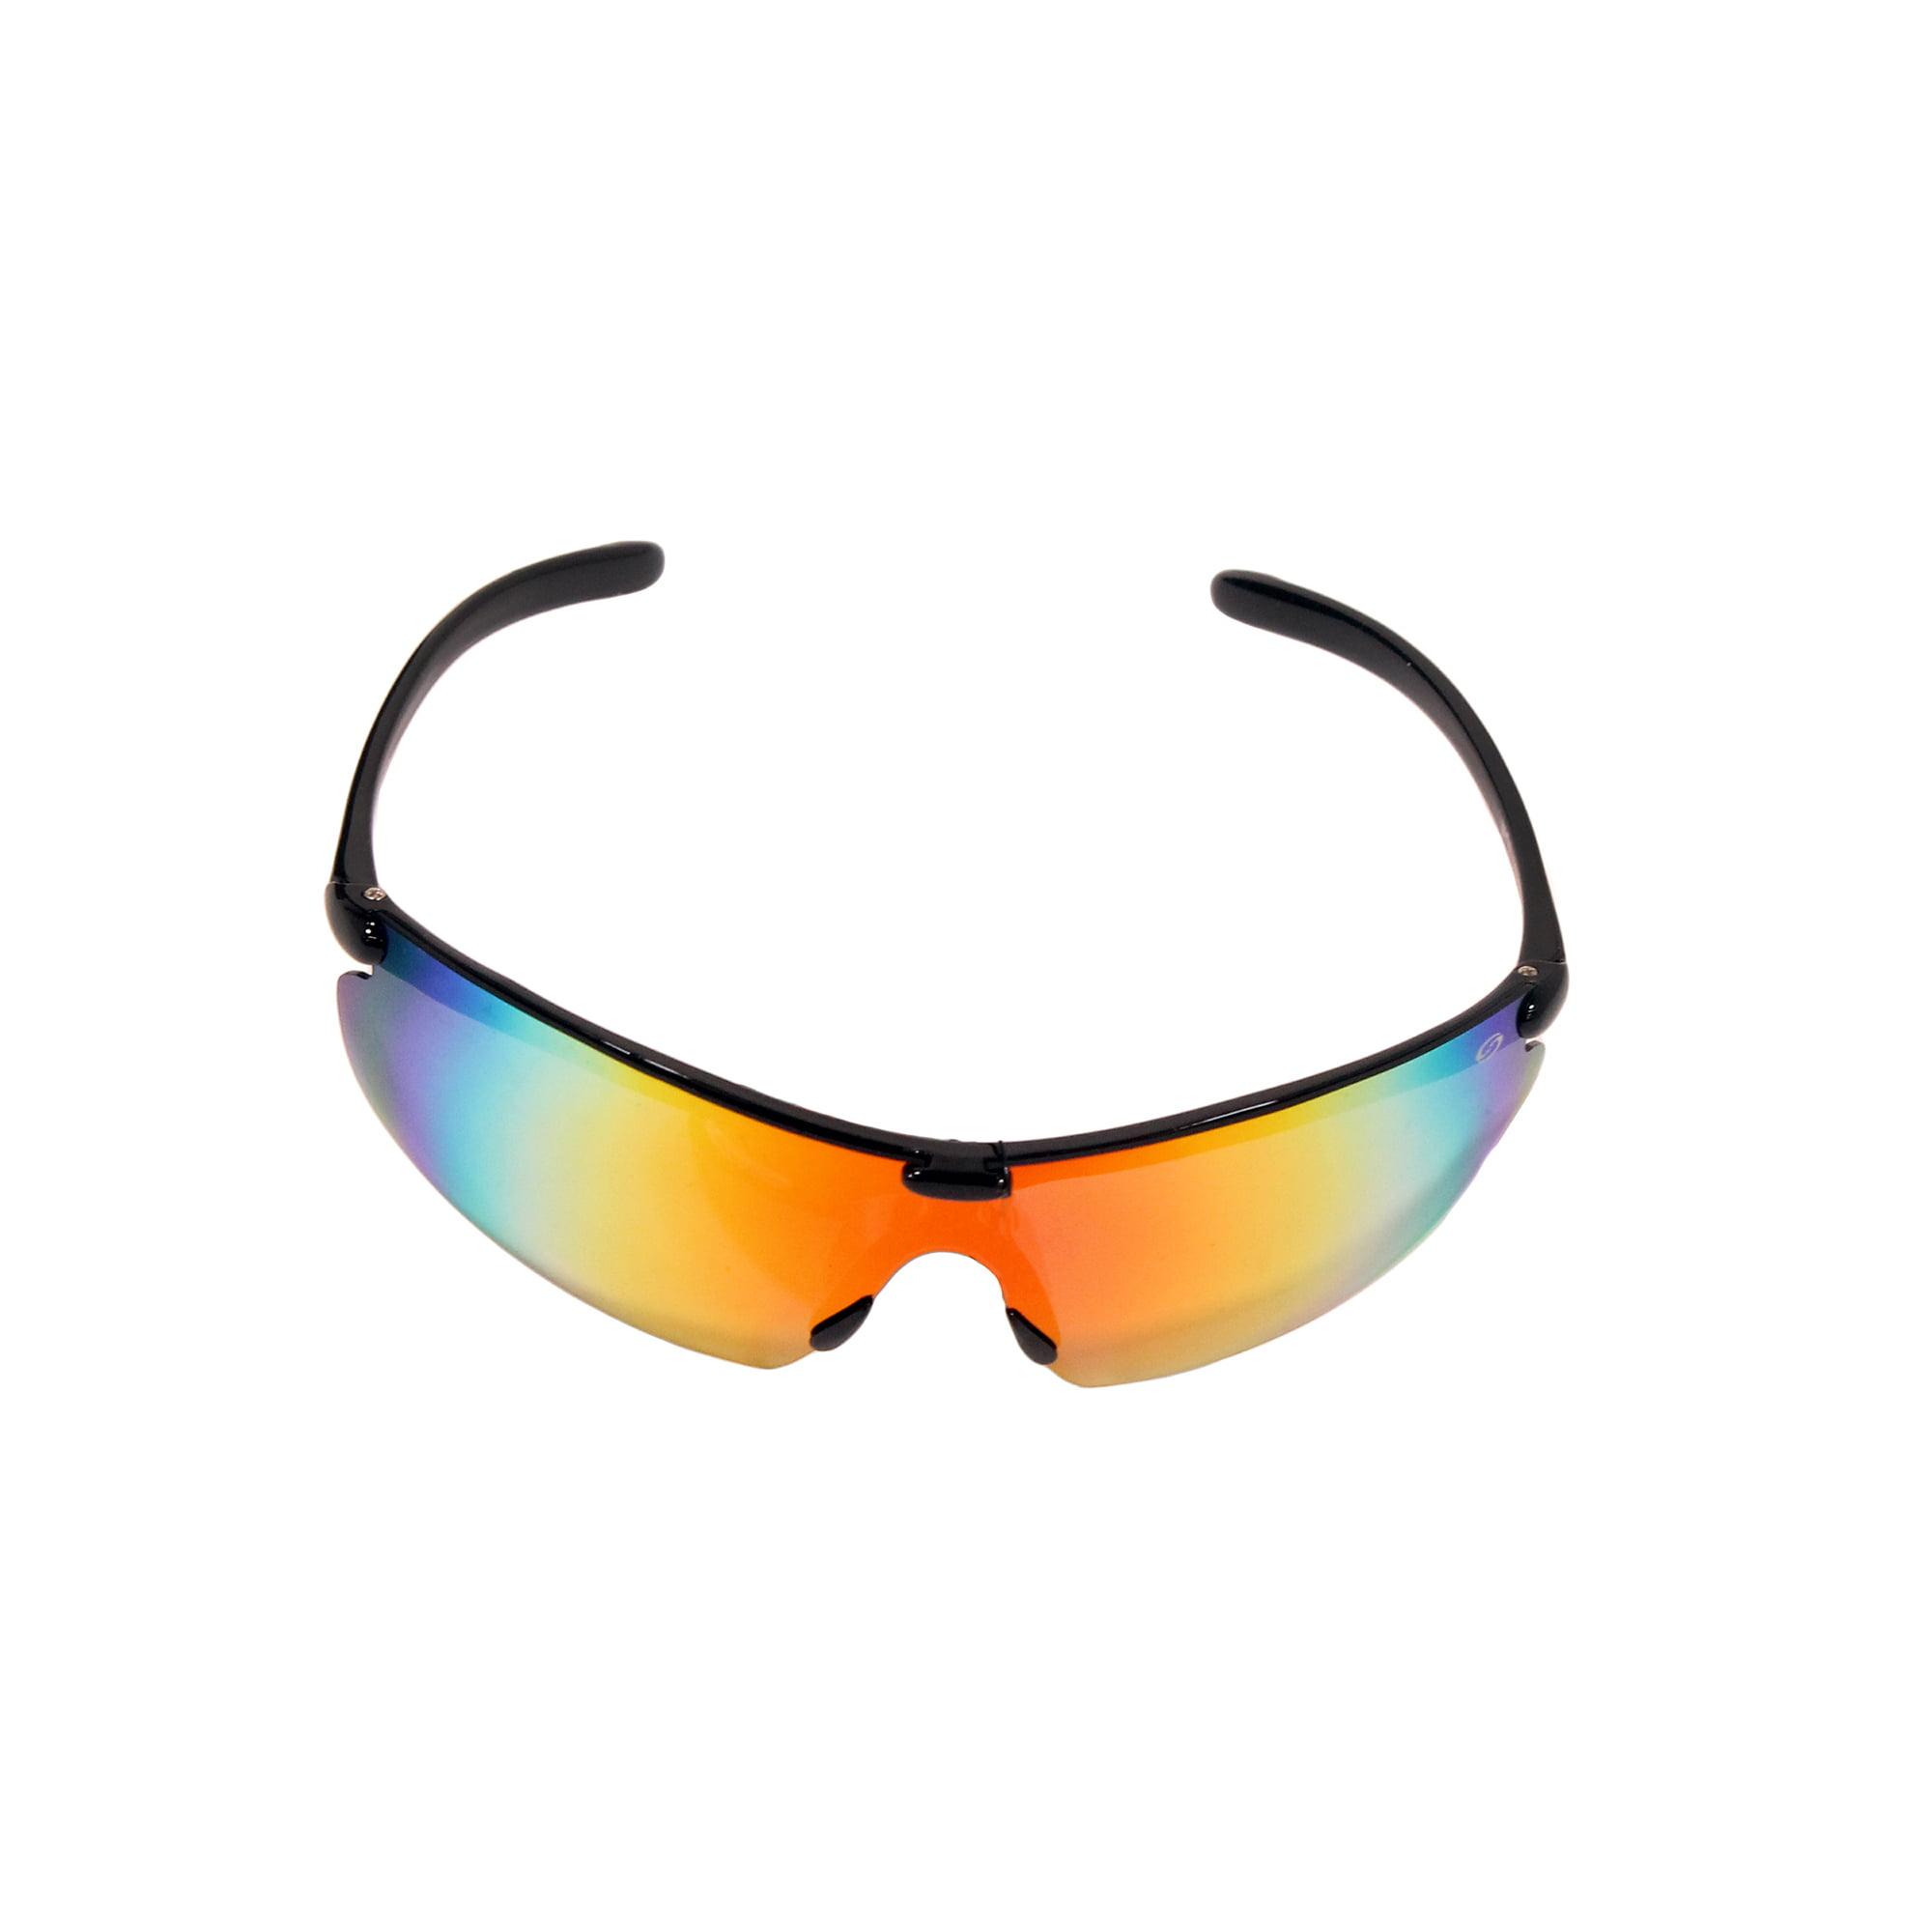 Strike King Lures SK PLus Waffle Sunglasses Matte Black Frame, Multi Layer Red Mirror Gray Base Lens by Strike King Lures